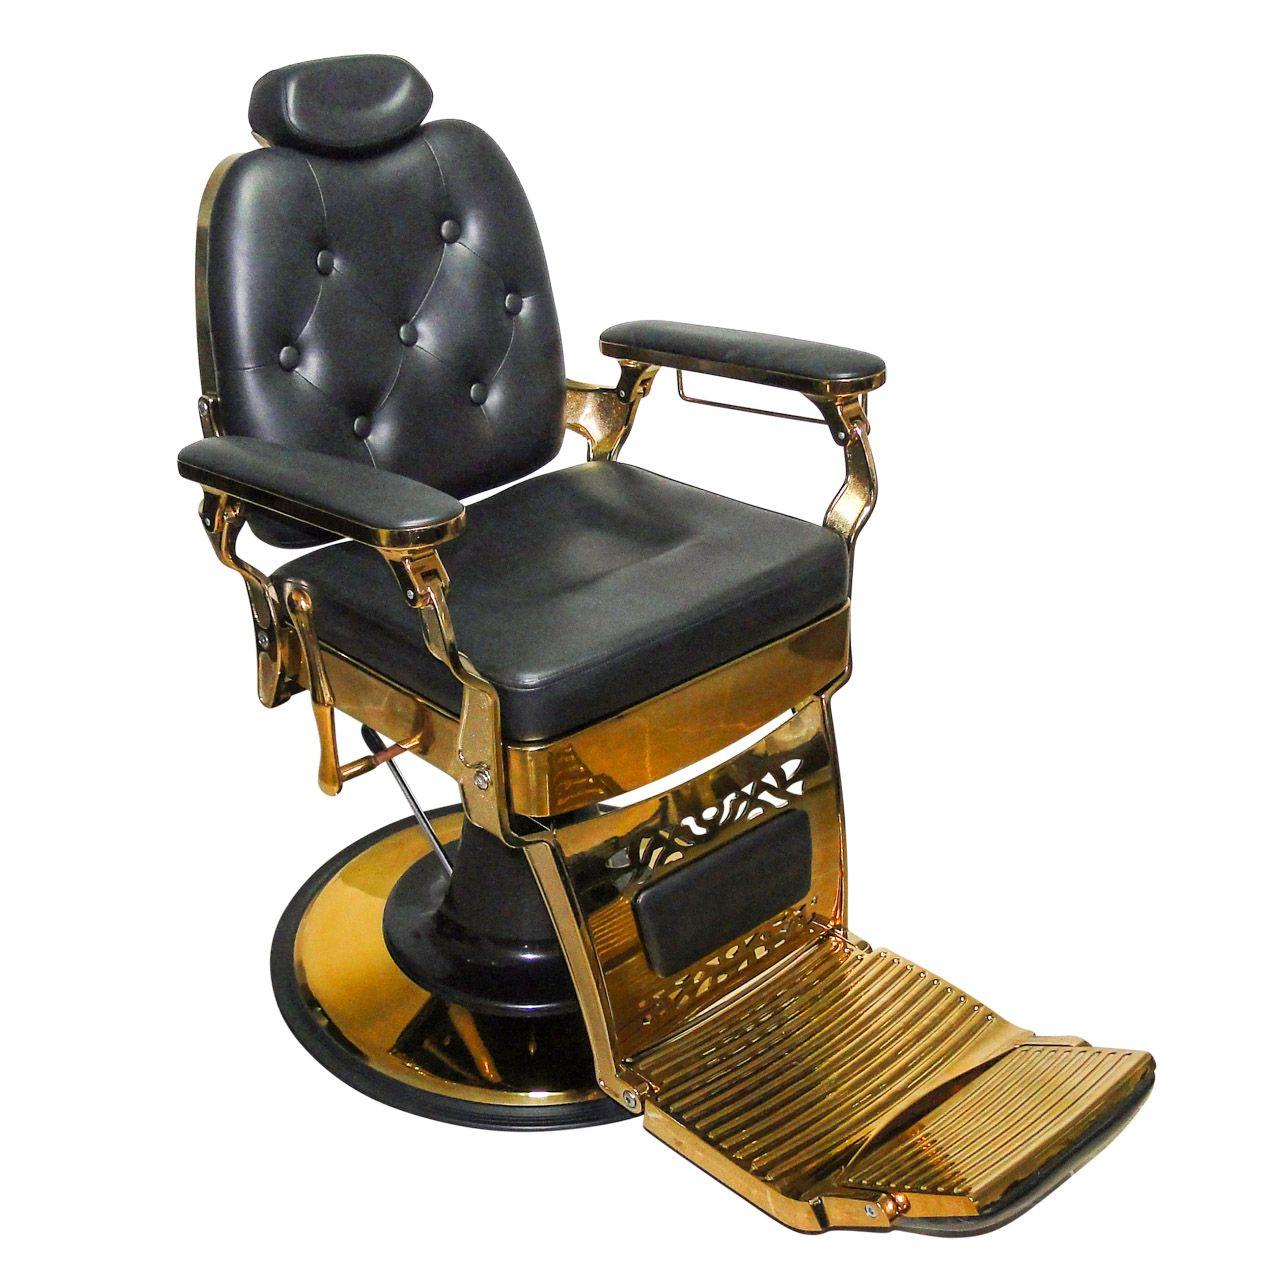 ItalPro - barber kreslo Condor Gold